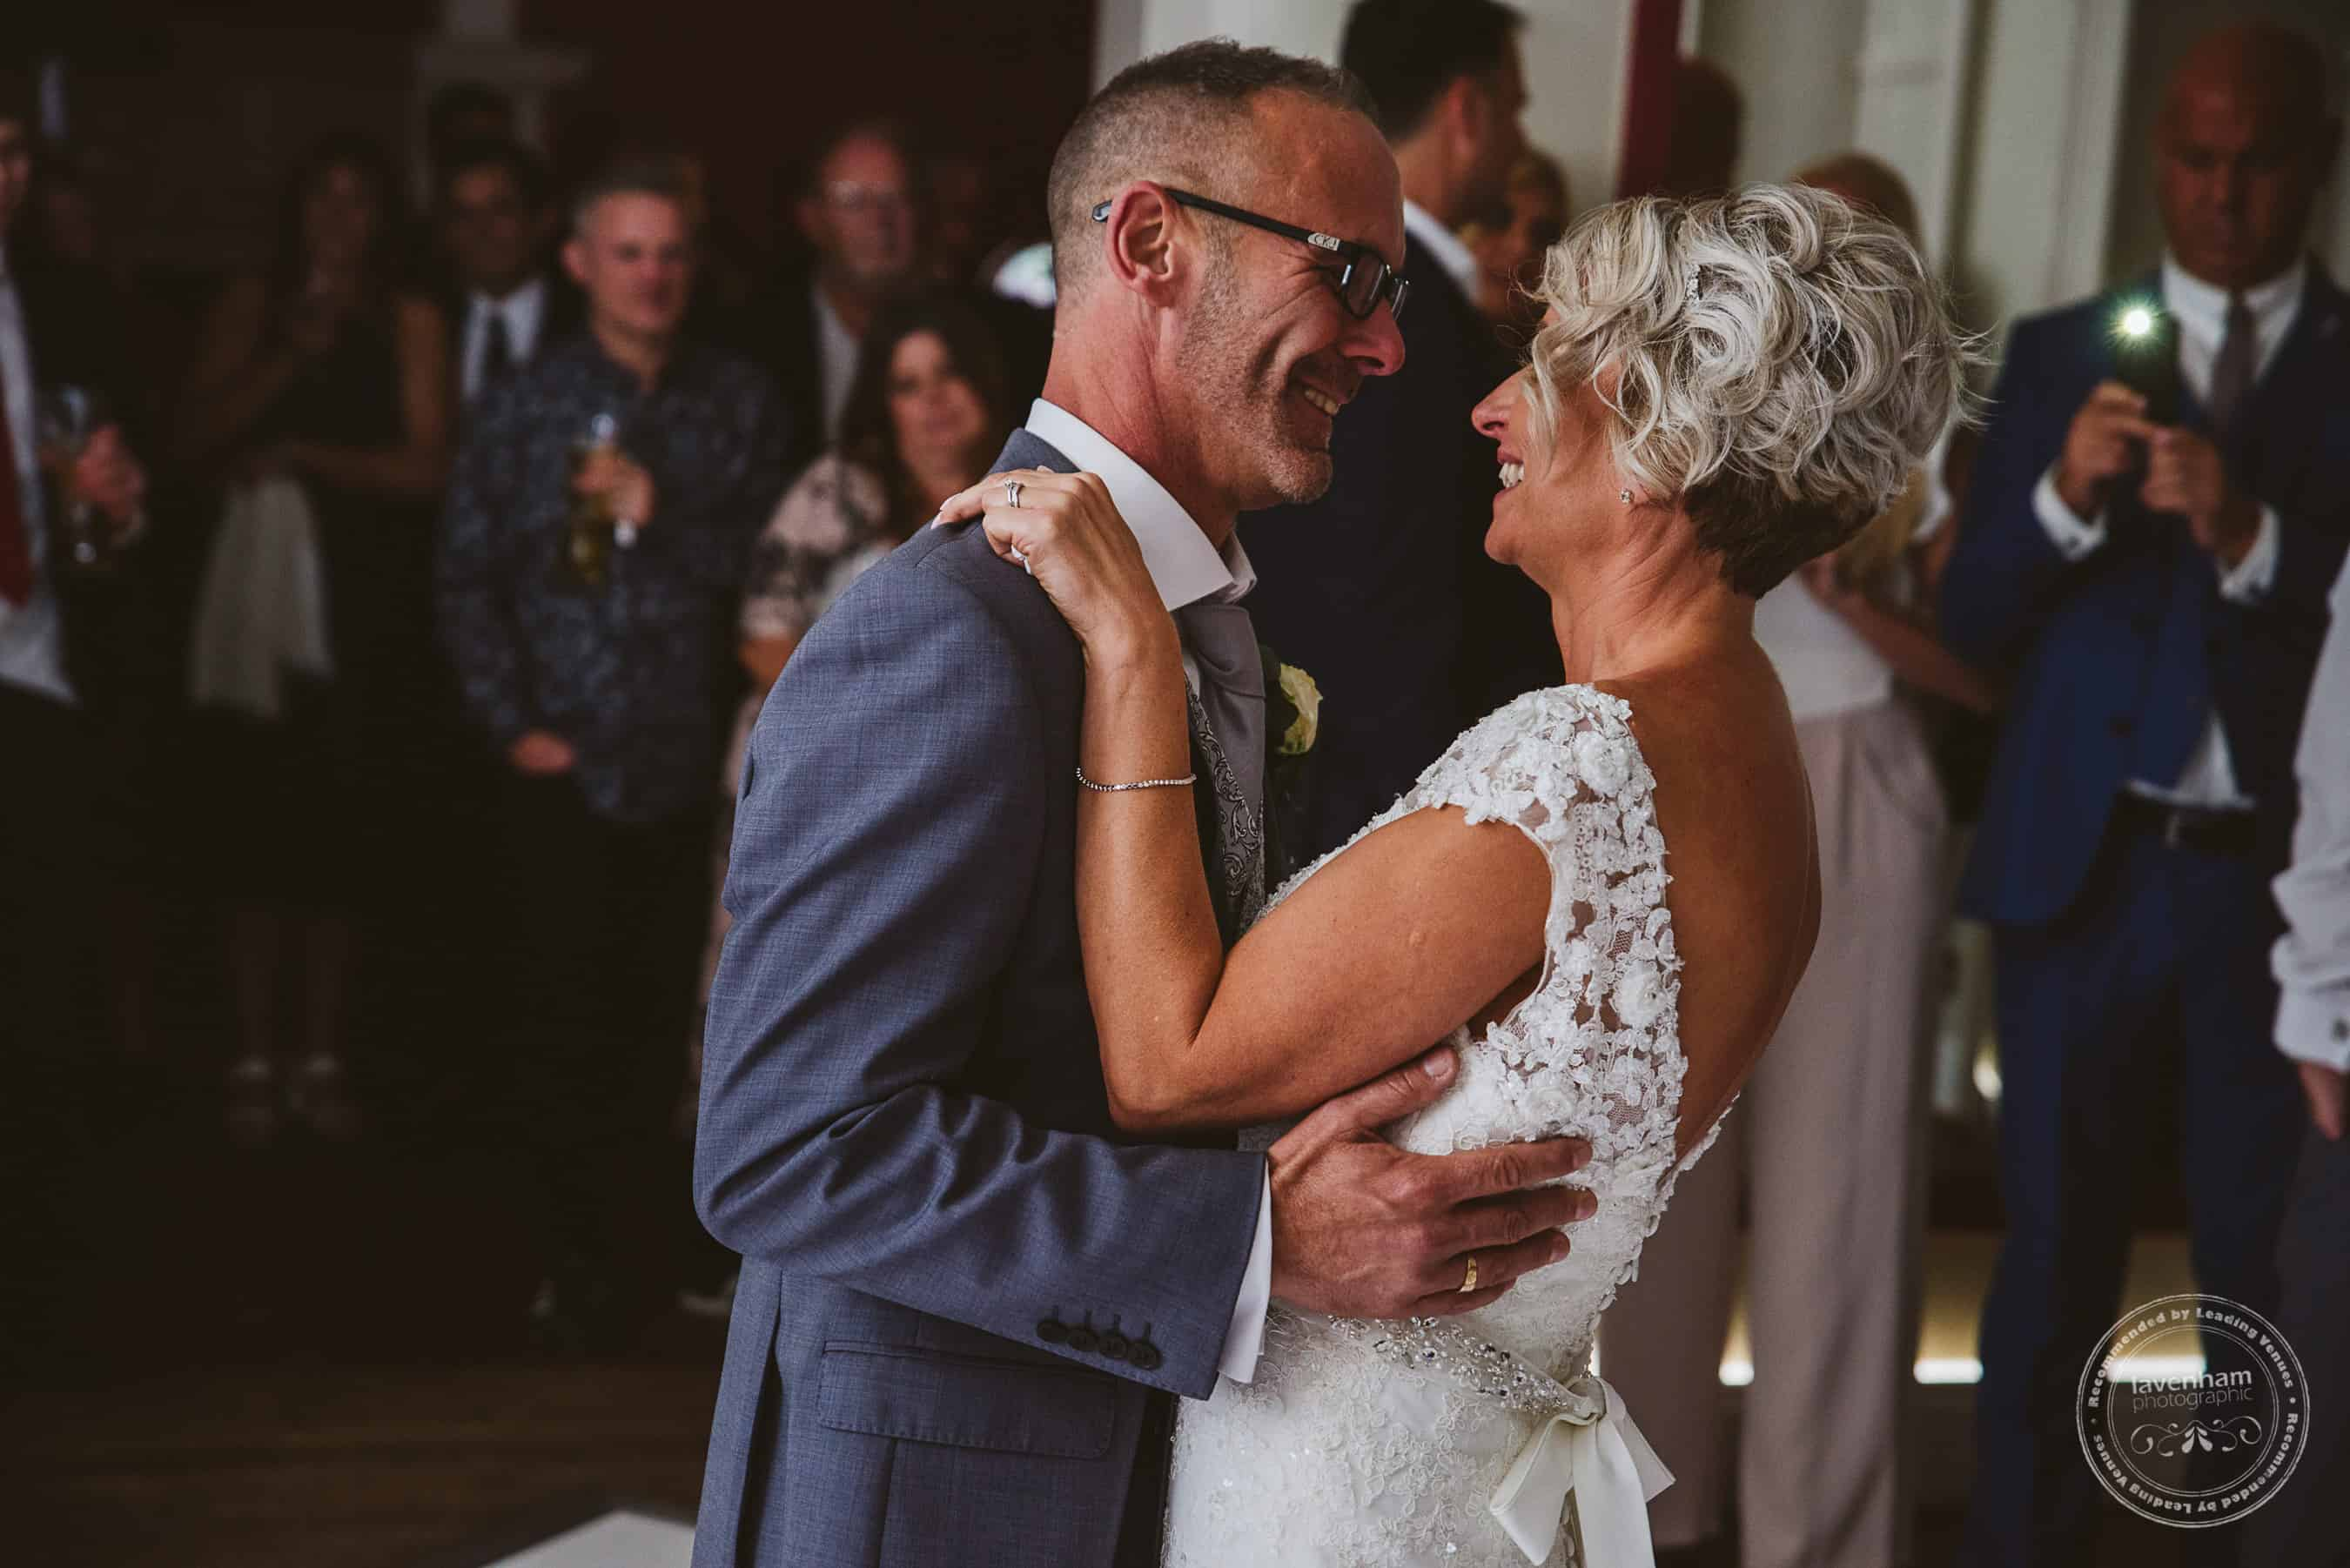 281018 Gosfield Hall Wedding Photography Lavenham Photographic 116